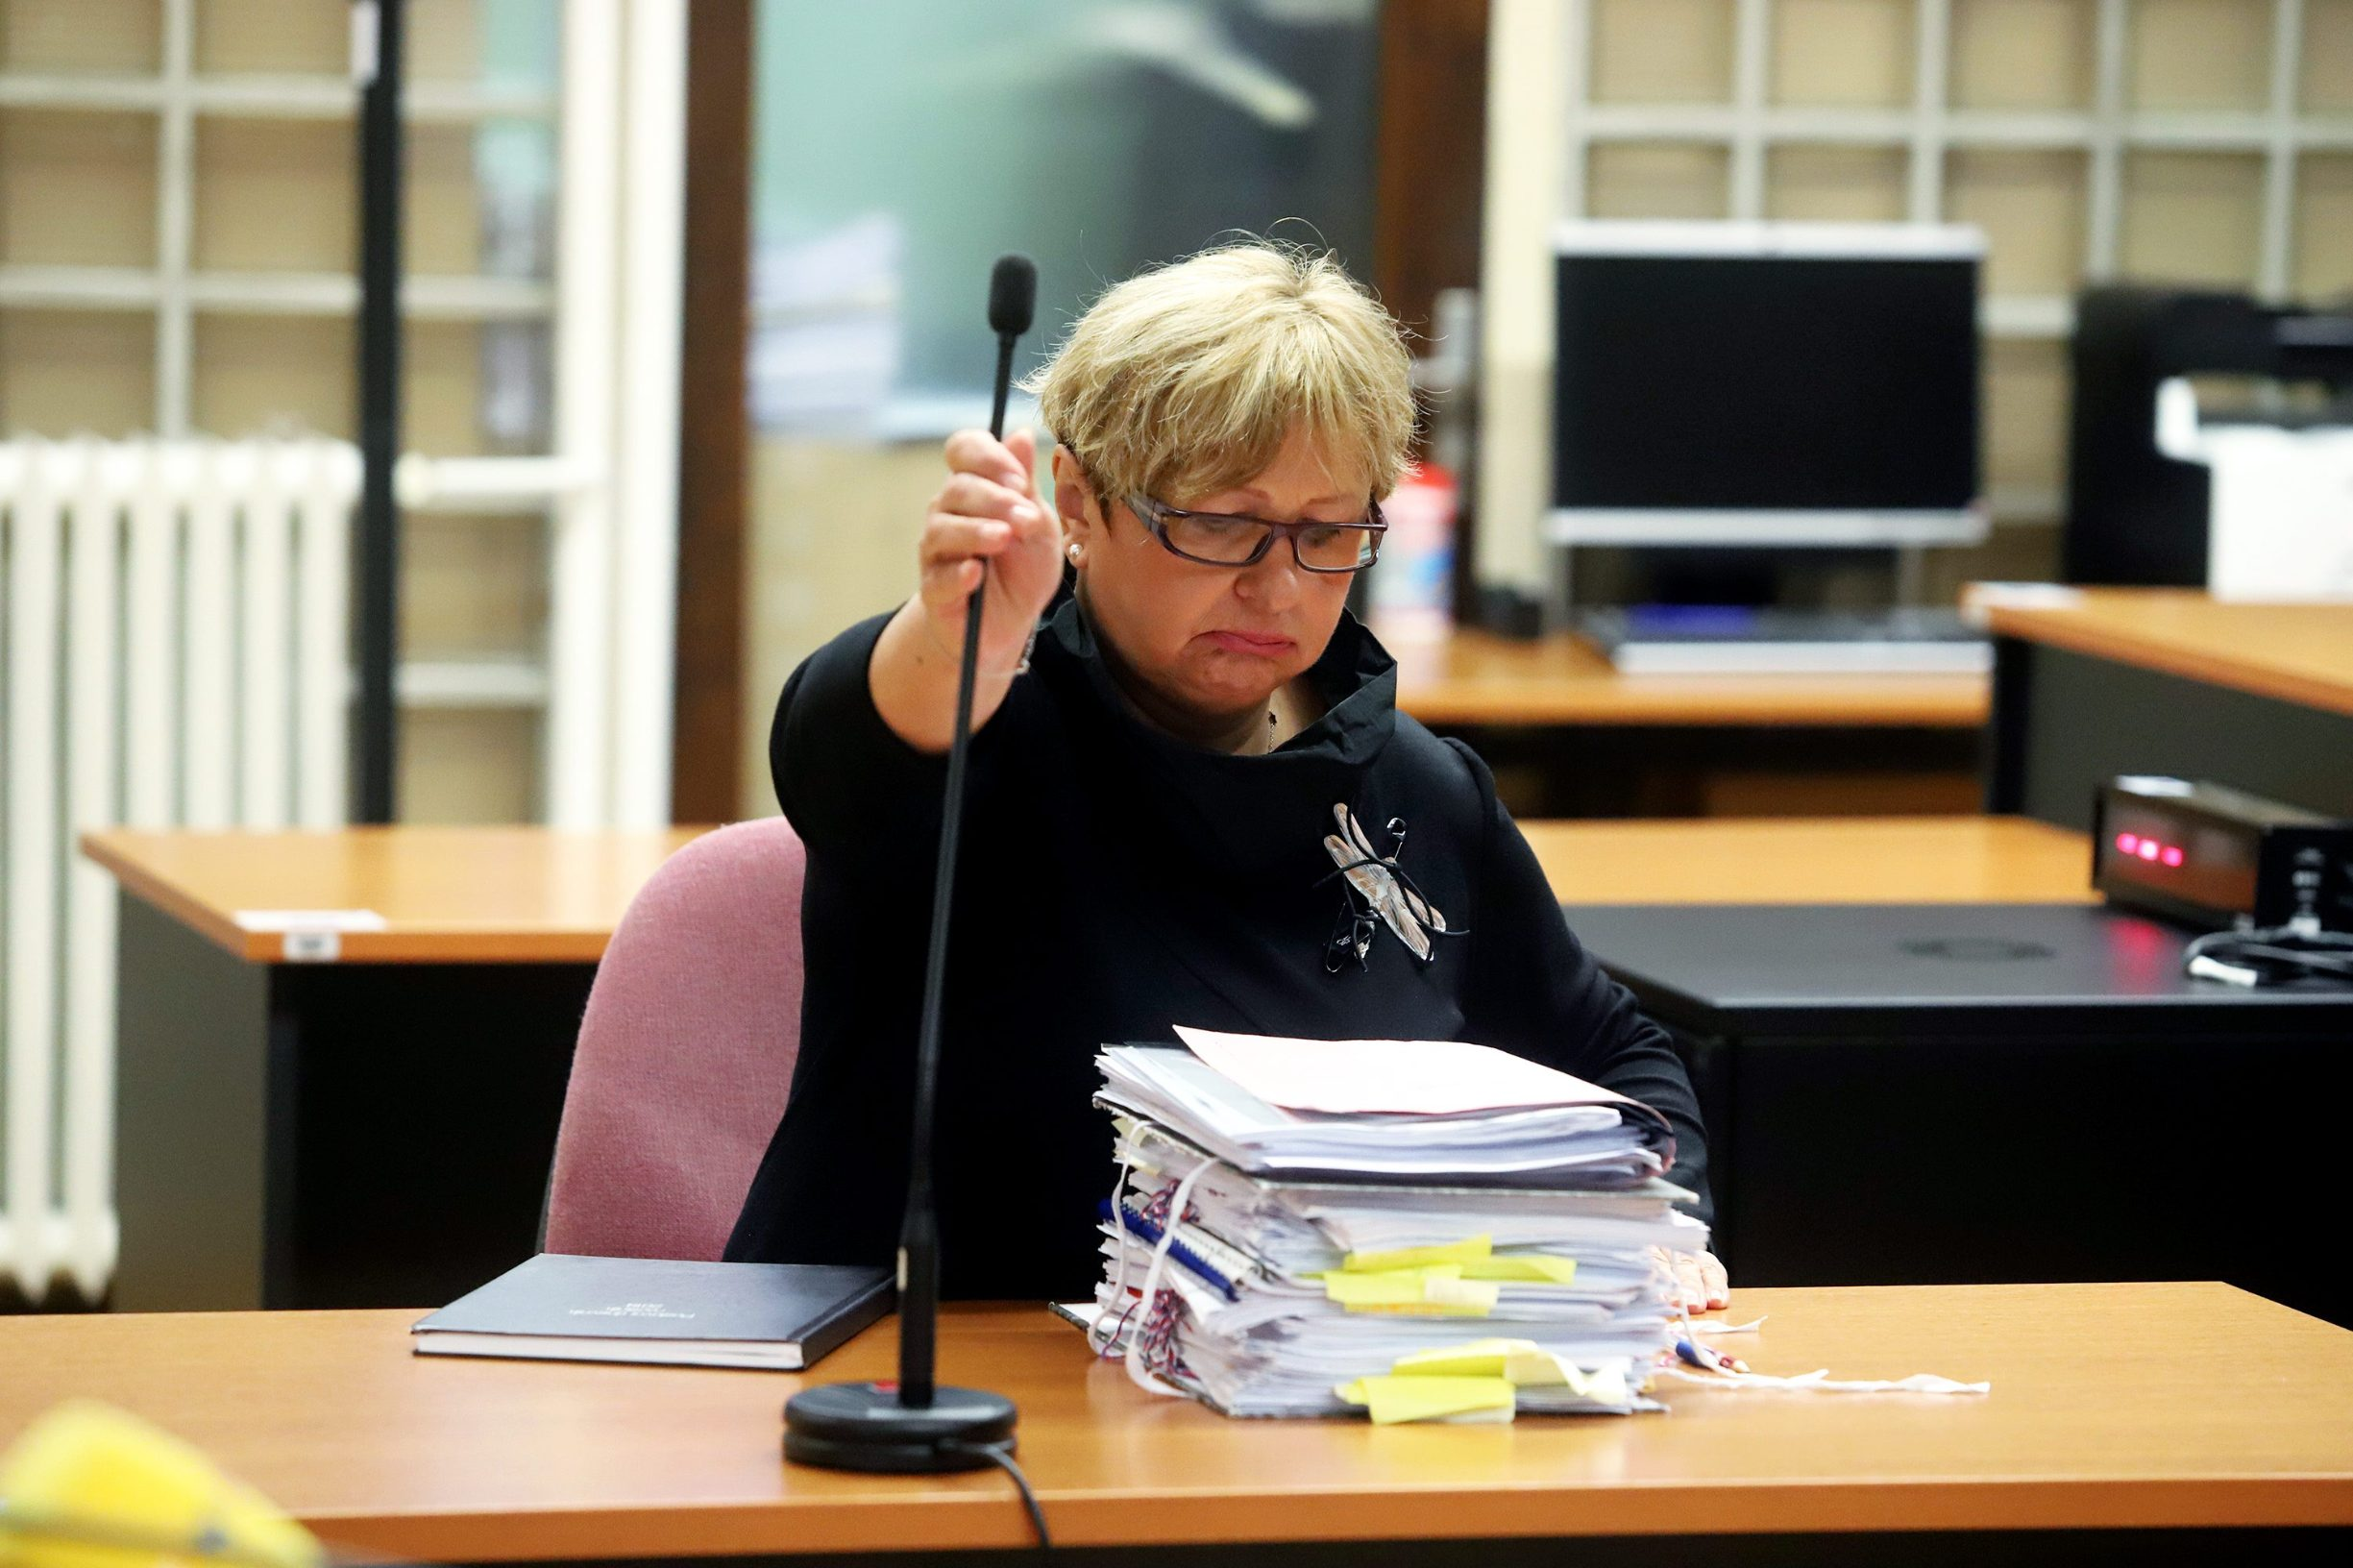 Varazdin, 211019. Na Zupanijskom sudu  nastavljene je sudjenje Smiljani Srnec za ubojstvo sestre. Na fotografiji: Irma Bagaric, tuziteljstvo. Foto: Zeljko Hajdinjak / CROPIX